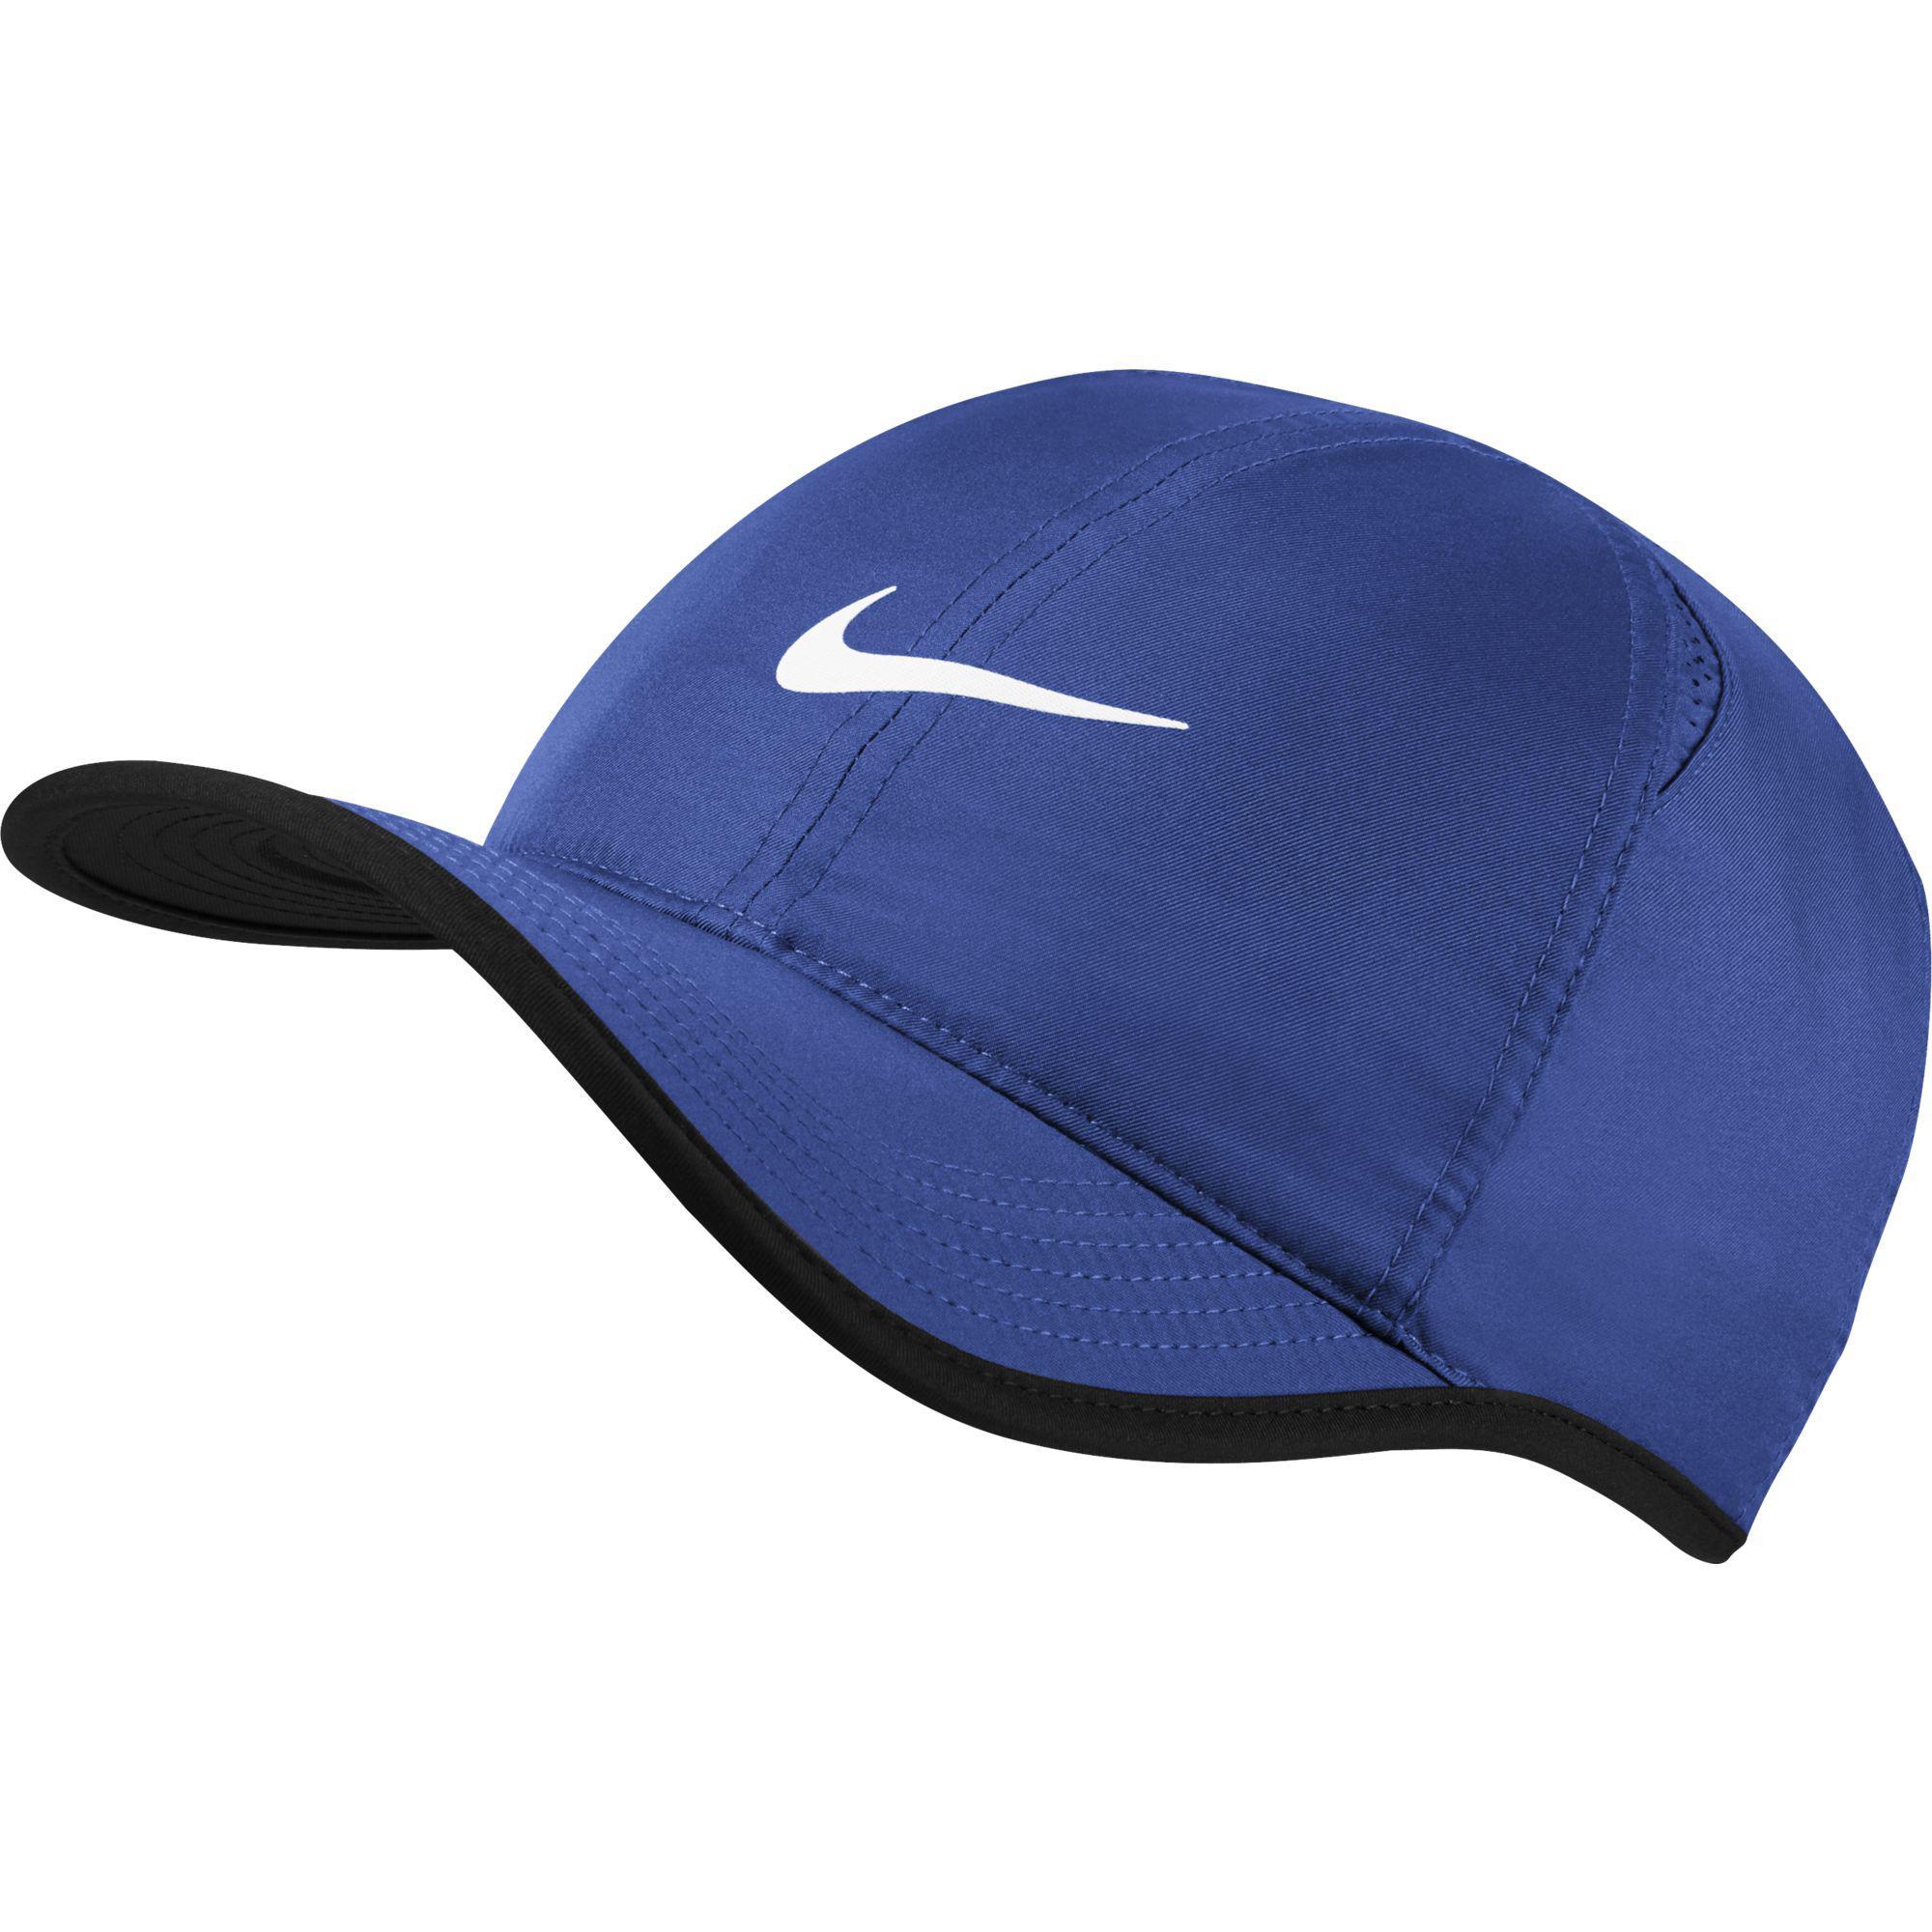 1b2dee003 Nike Featherlight Adjustable Cap - Game Royal